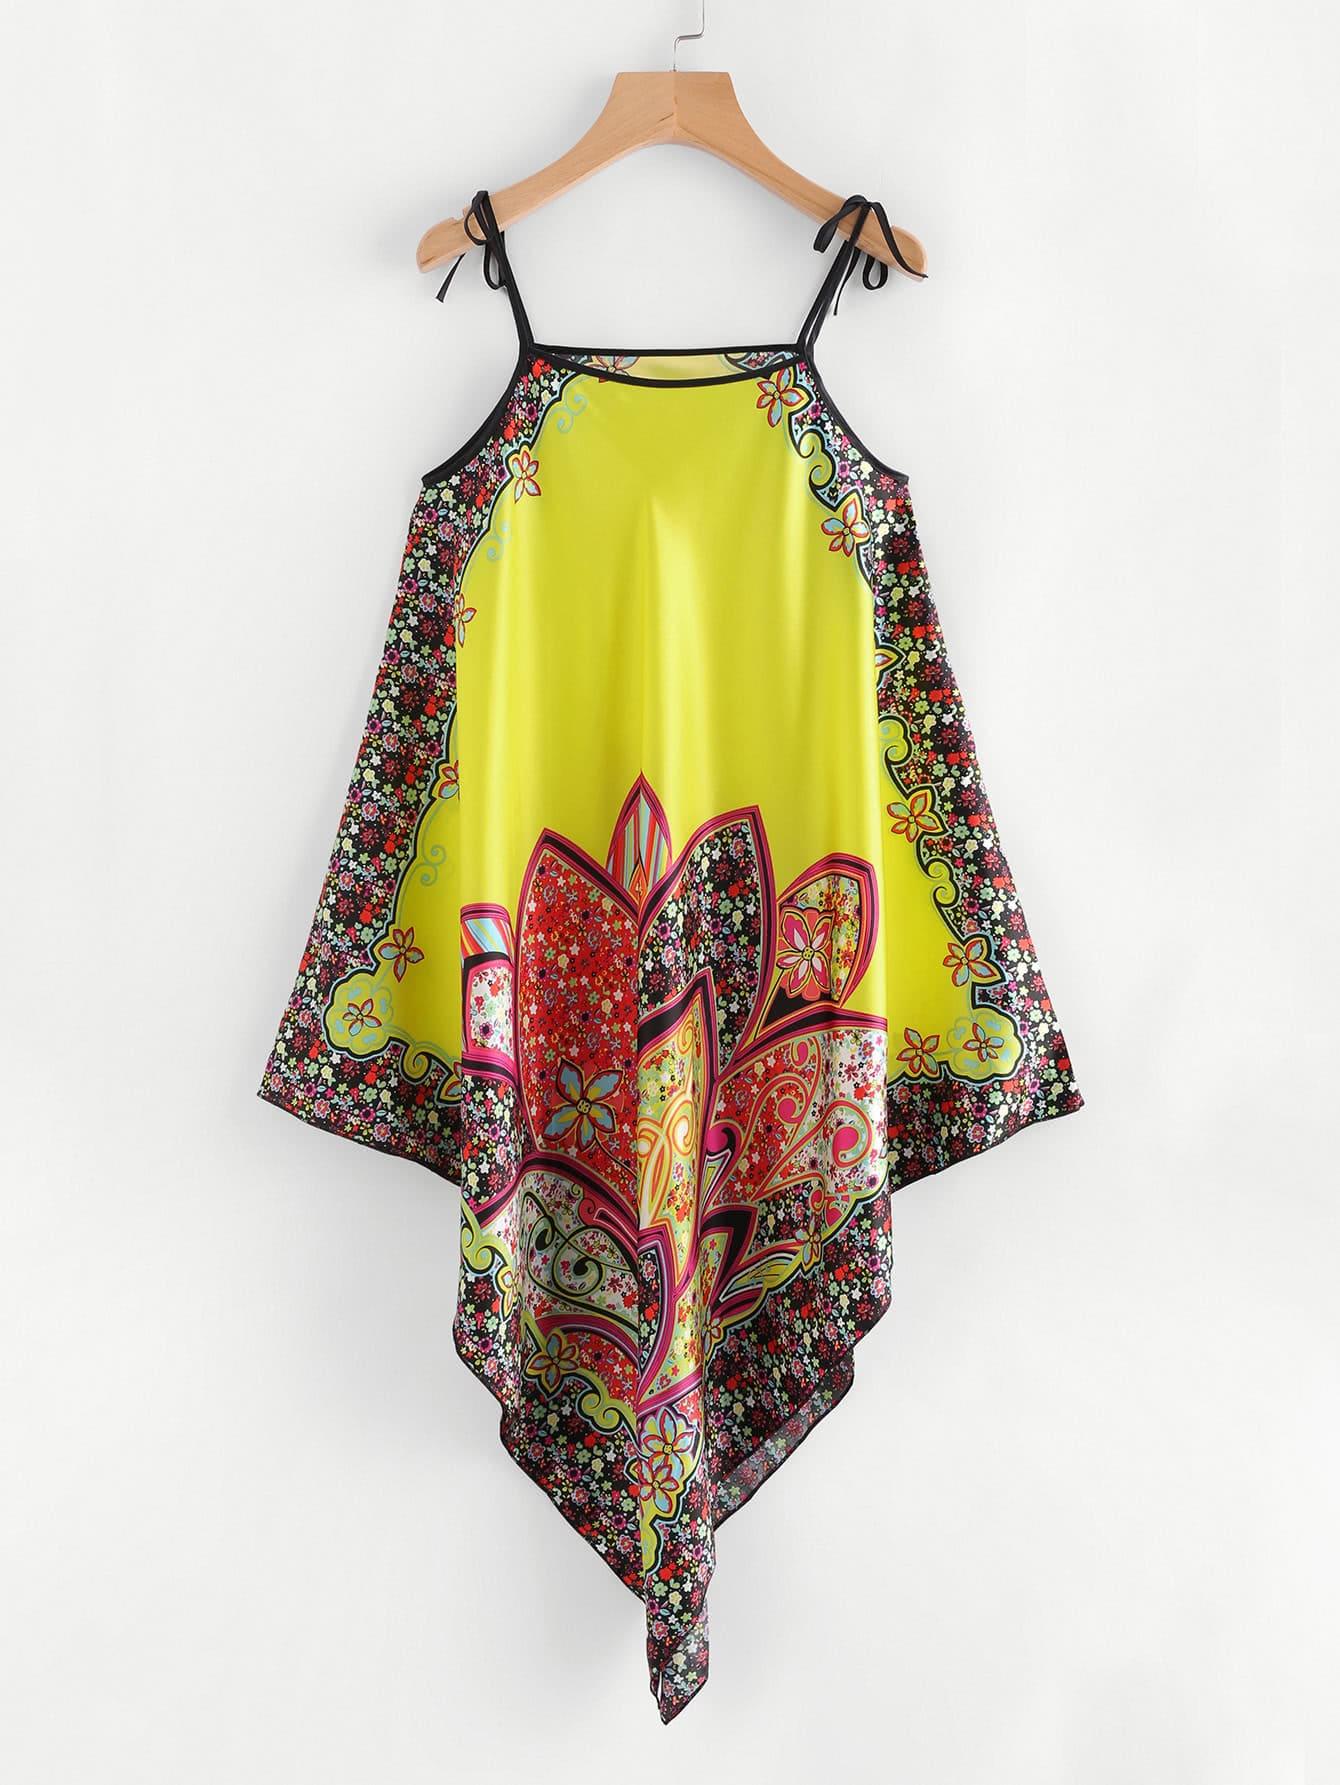 Calico Print Asymmetrical Satin Cami Dress